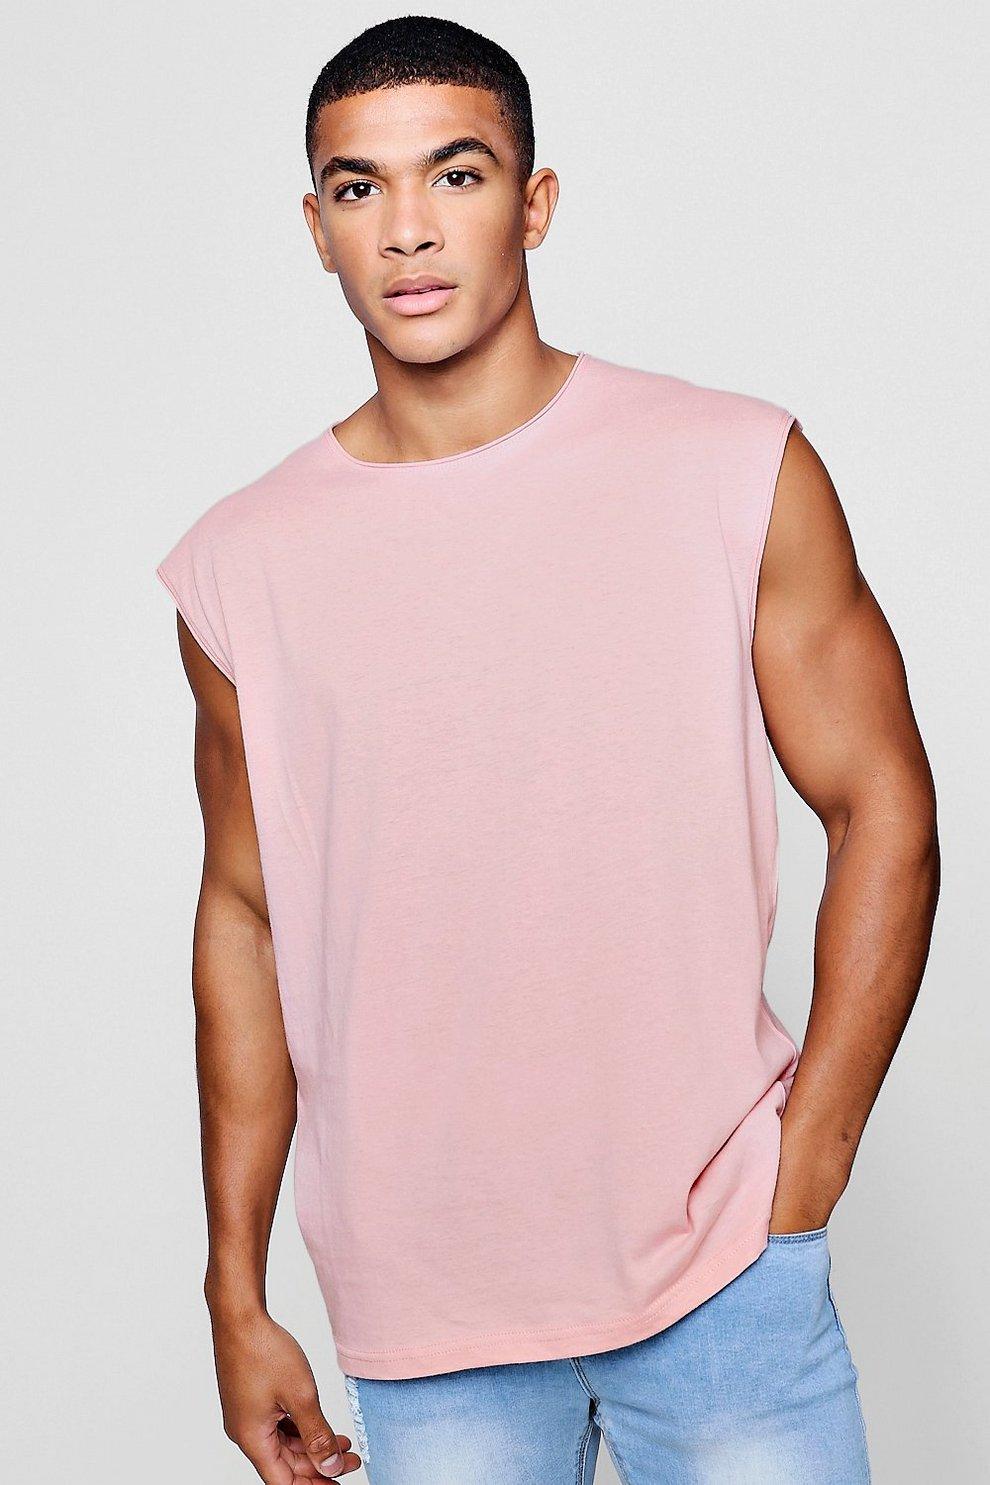 Camiseta Tirantes Sin Bajo De Rematar Cuello Redondo Con Vuelto tdhQsr